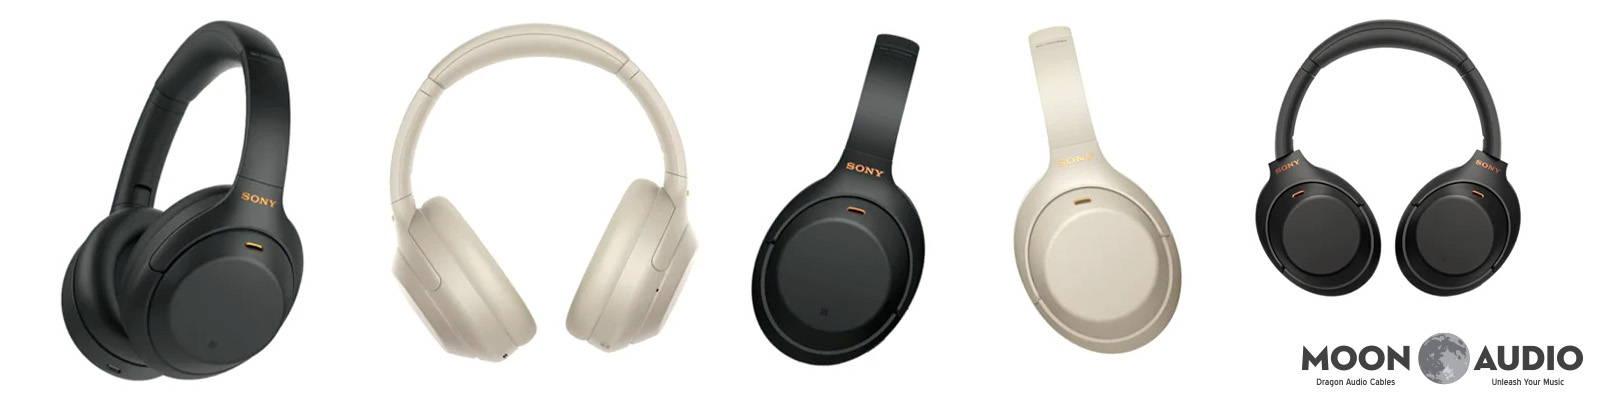 Sony XM4 Headphone Banner